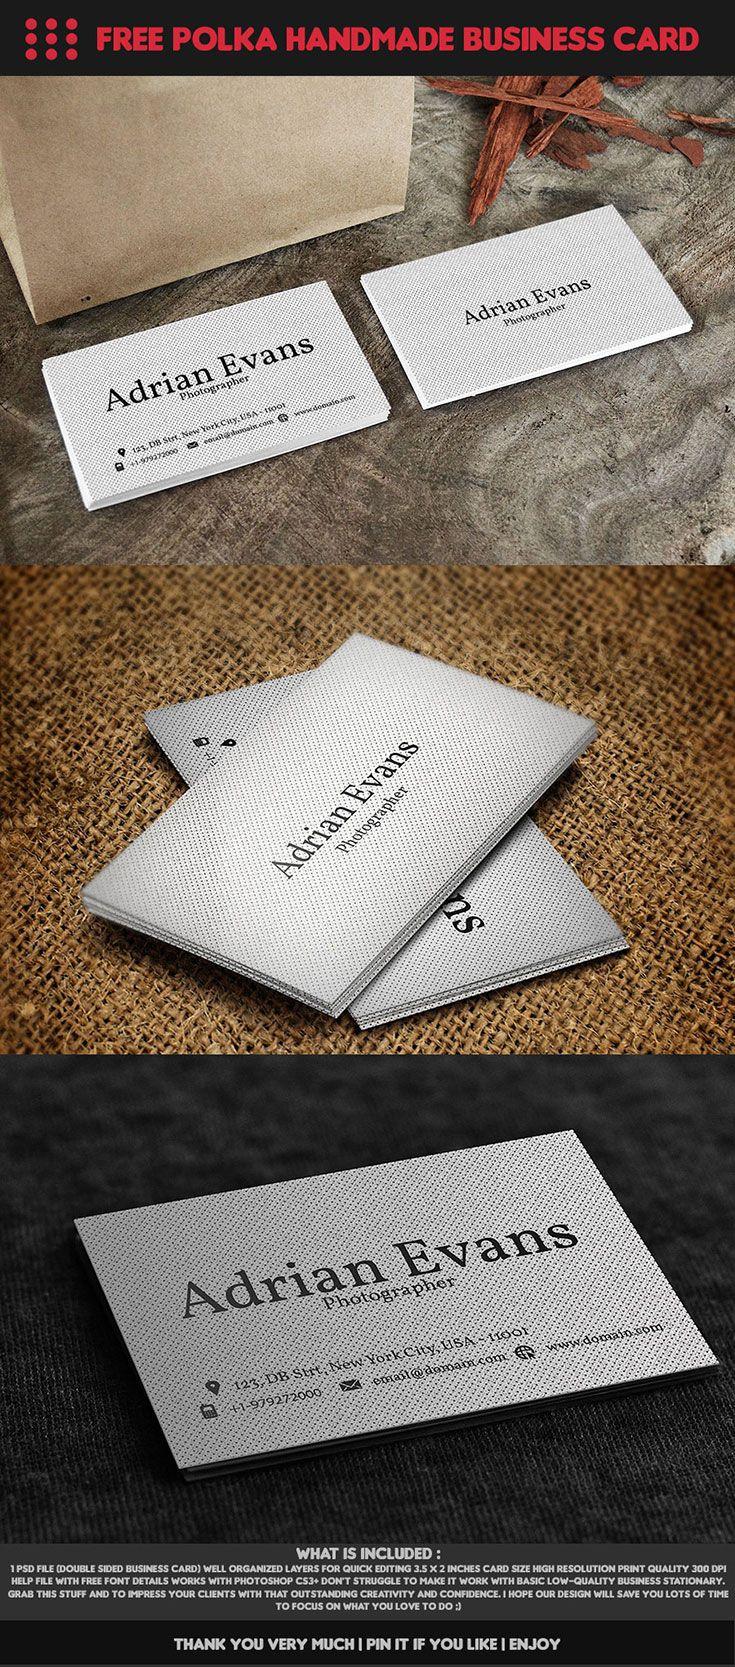 61 best Business Cards images on Pinterest | Business card design ...